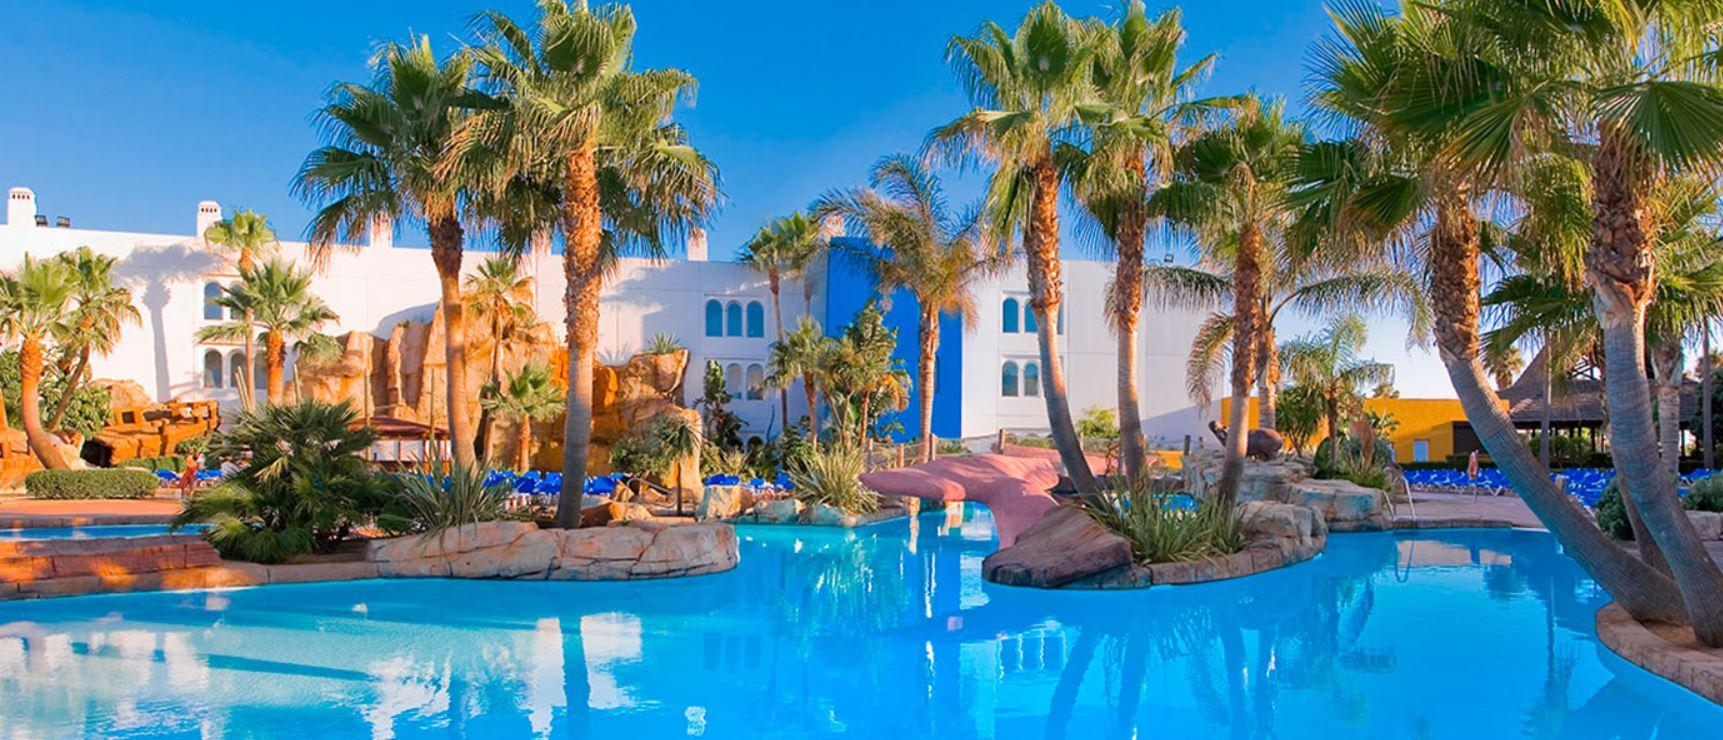 Hotel Playaballena Cadiz Vista General Piscinas